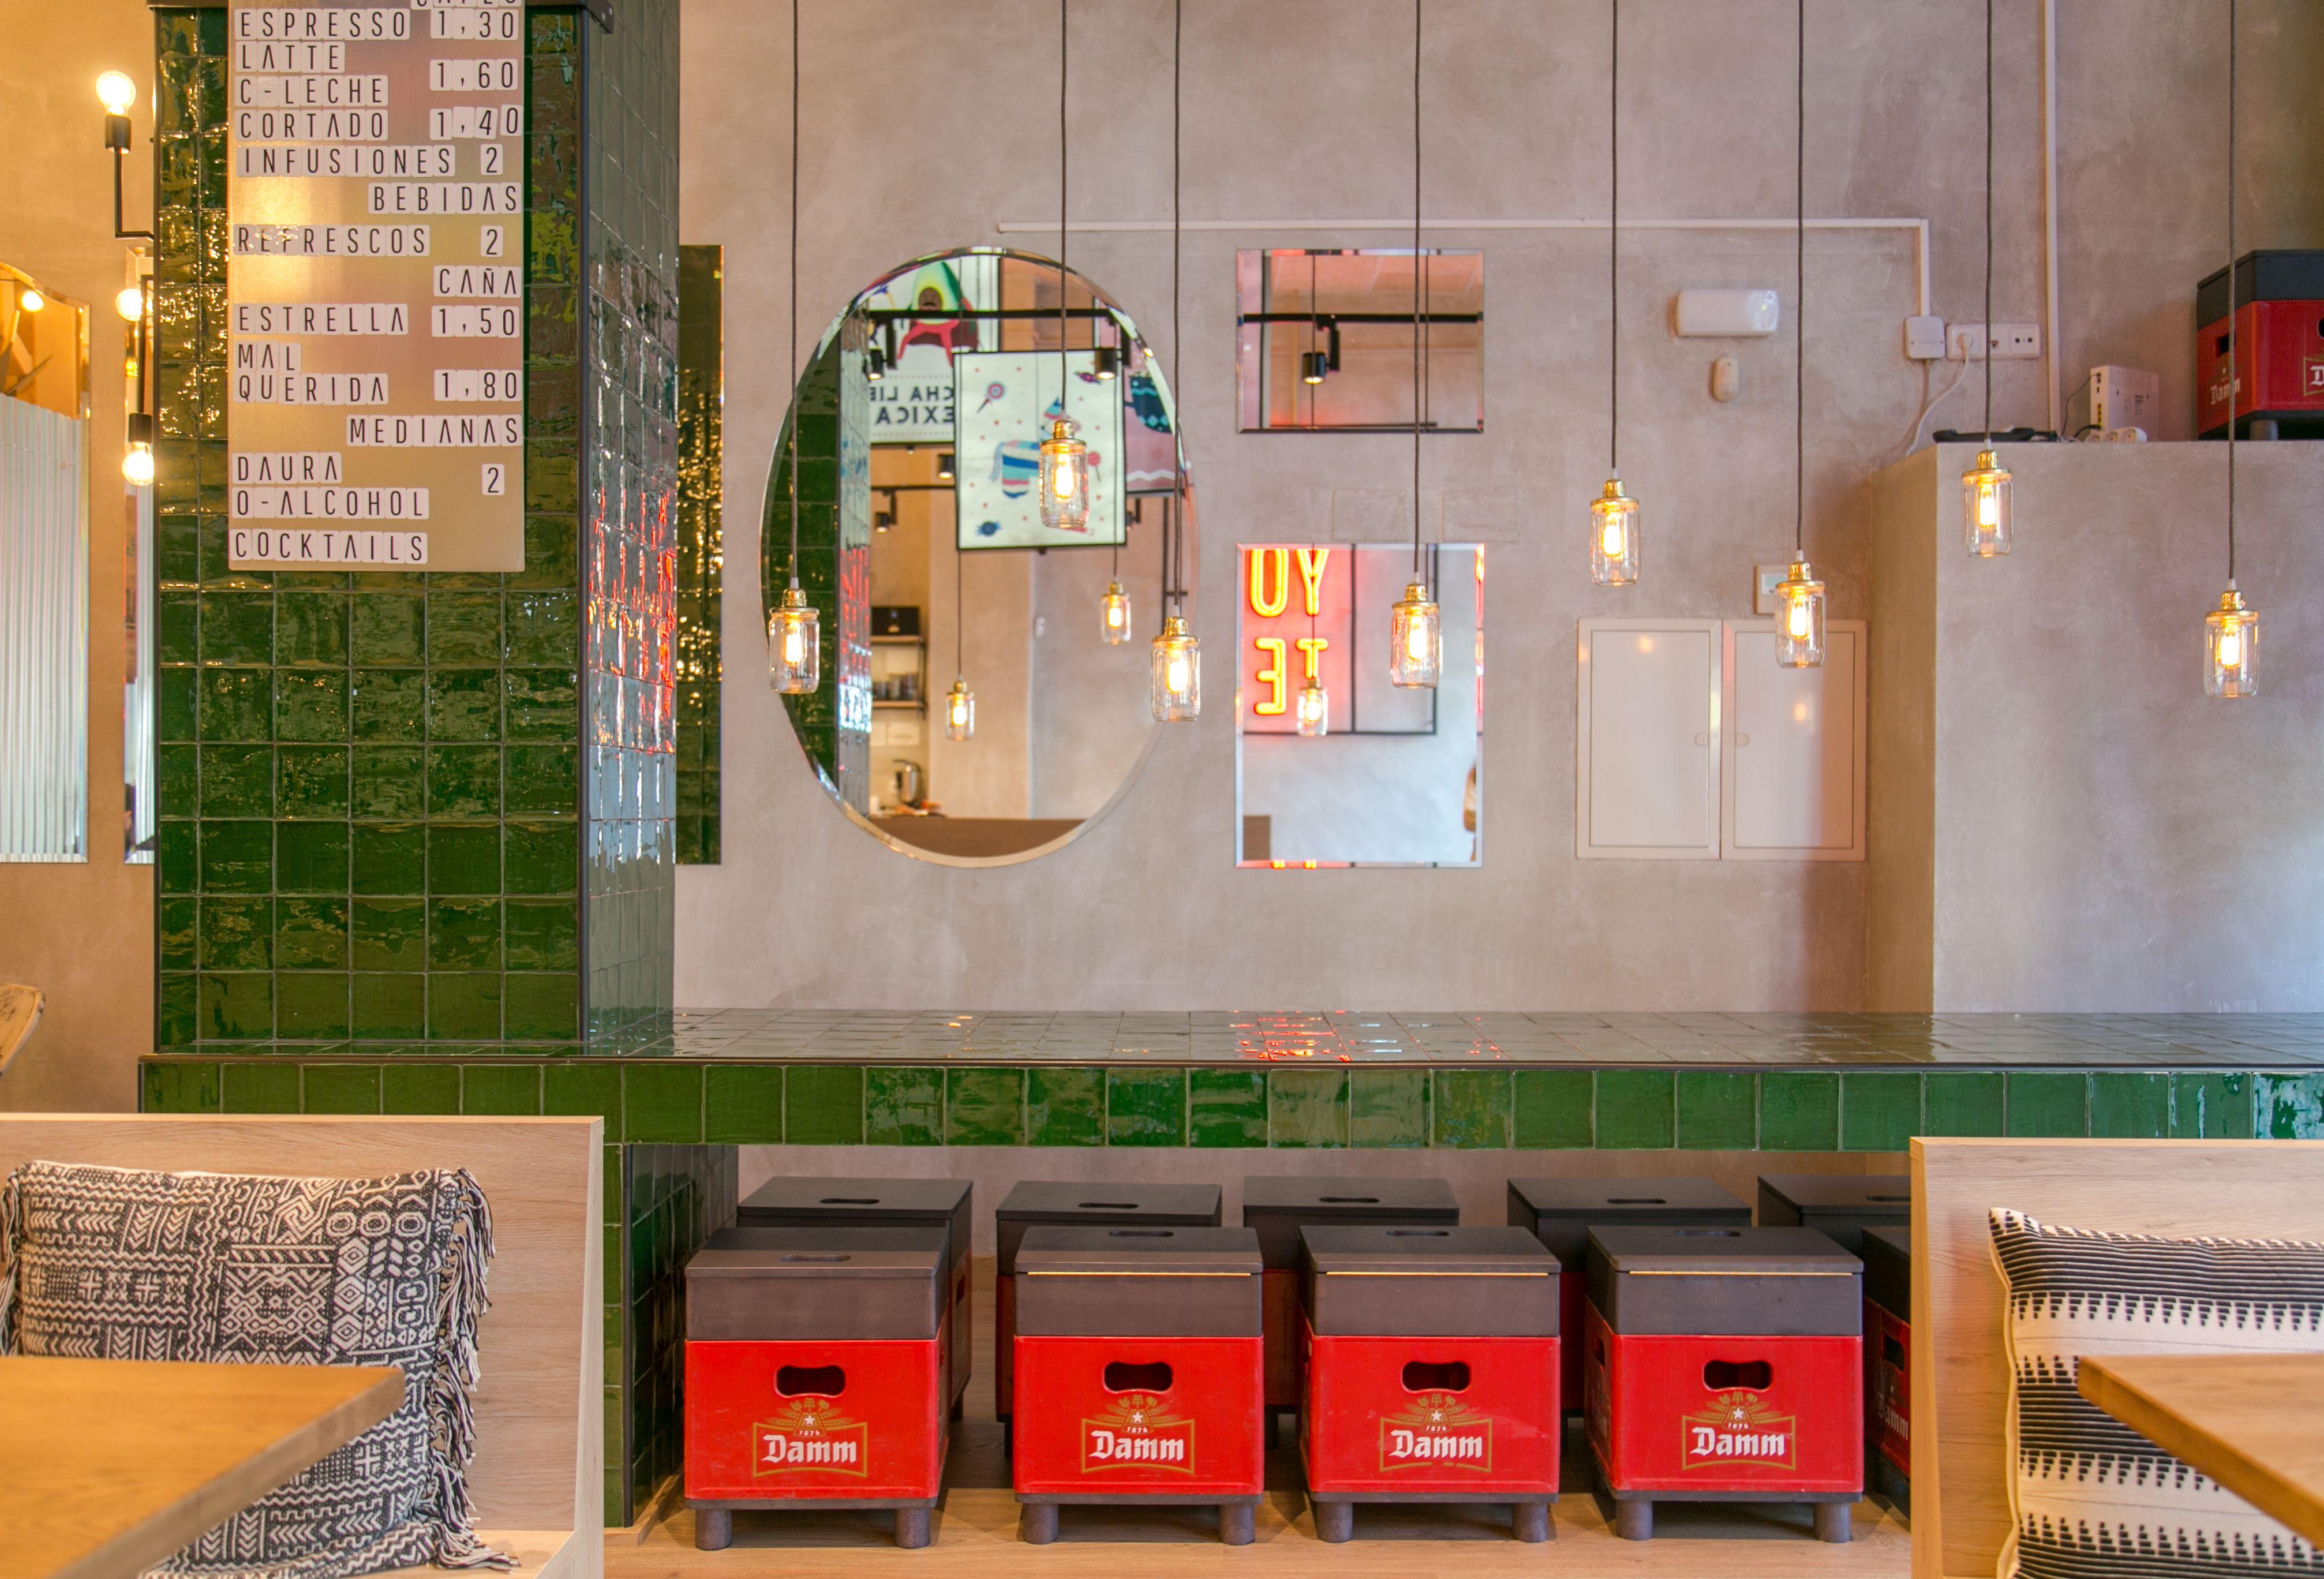 Casa Coyote Interiorismo Restaurante Casas Interiores